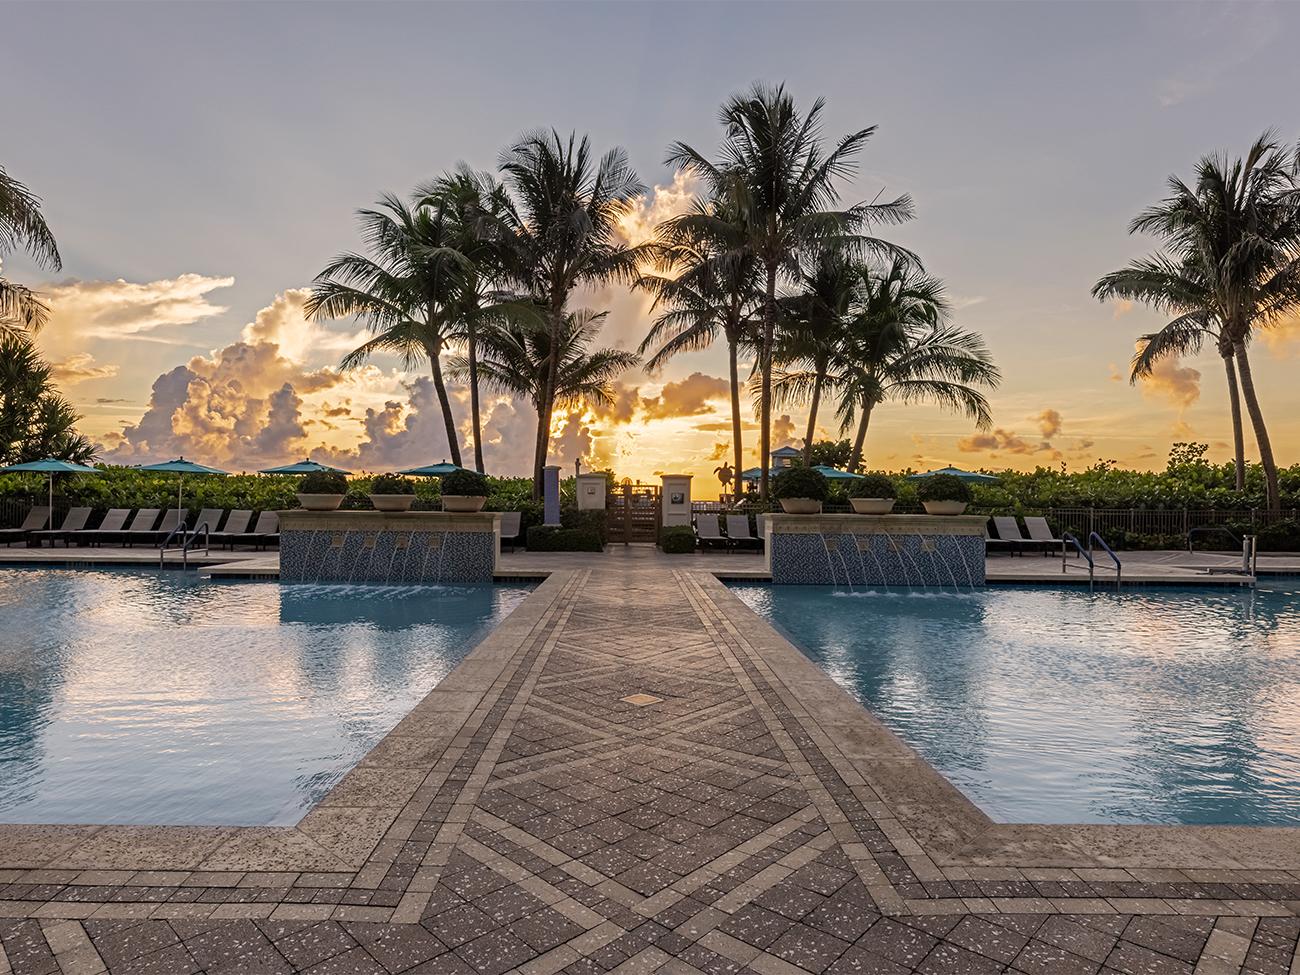 Marriott's Oceana Palms Main Pool. Marriott's Oceana Palms is located in Riviera Beach, Florida United States.